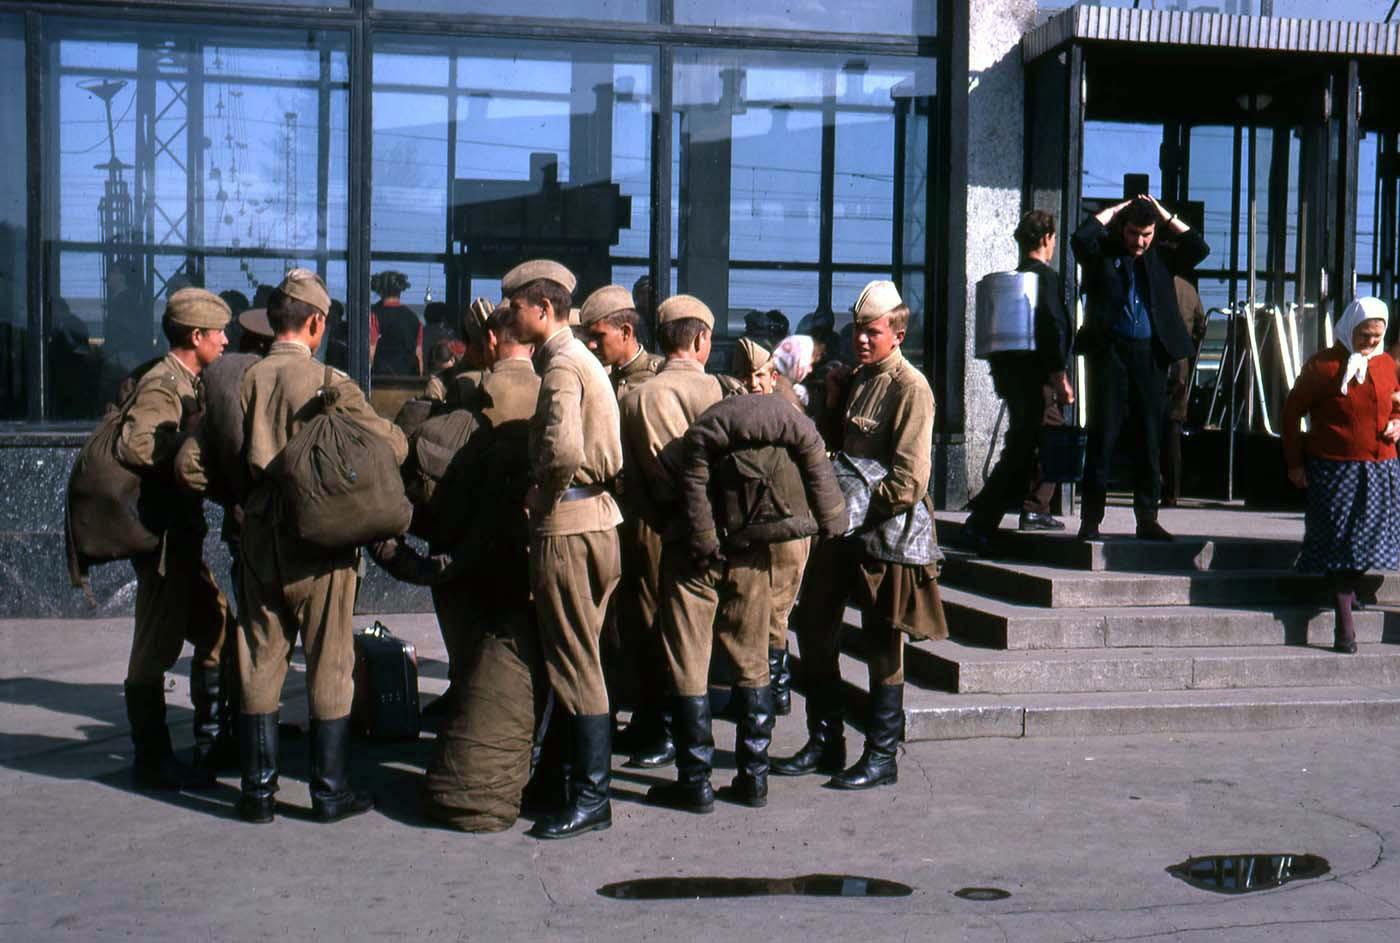 1969 Irkutsk by Snider Irving6